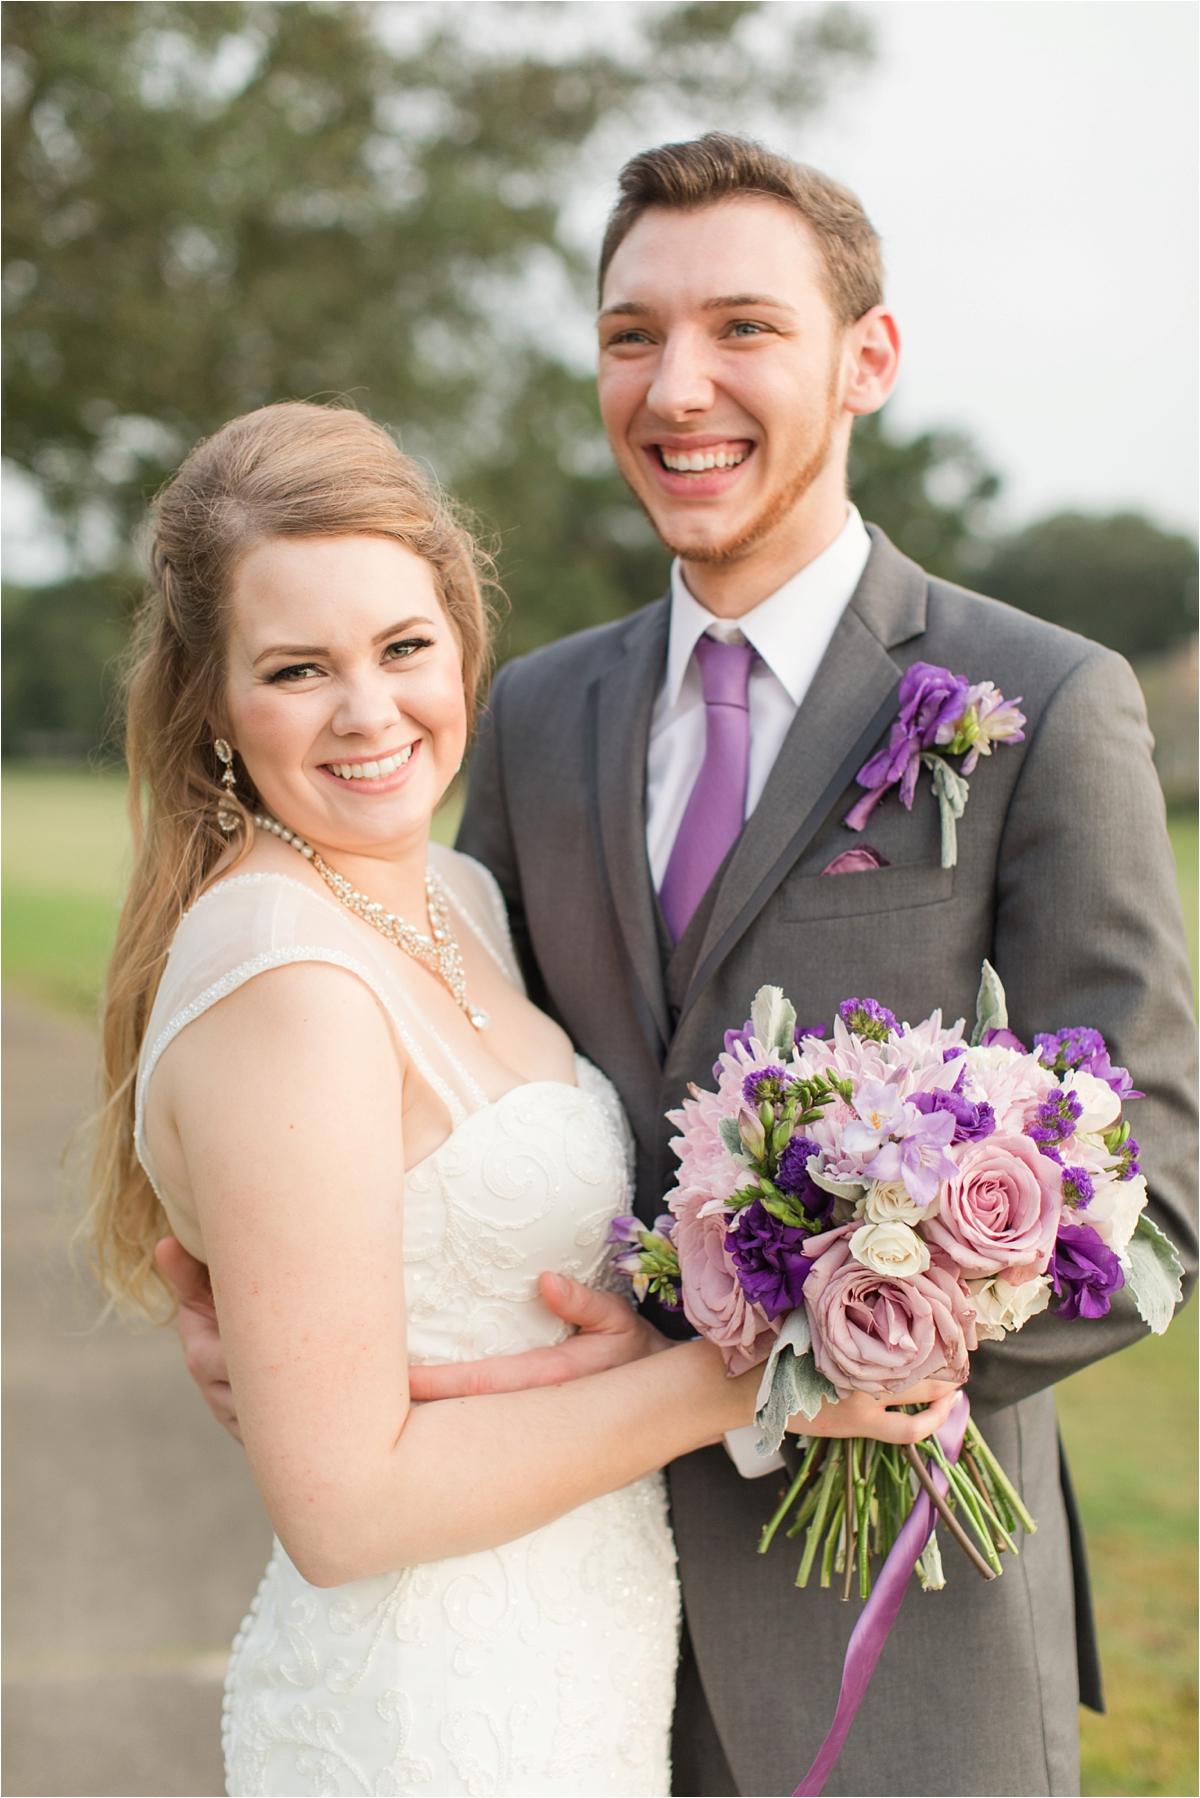 bride-groom-portraits-photos-chunky-jewelry-lavender-bouquet-alabama-wedding-photographer